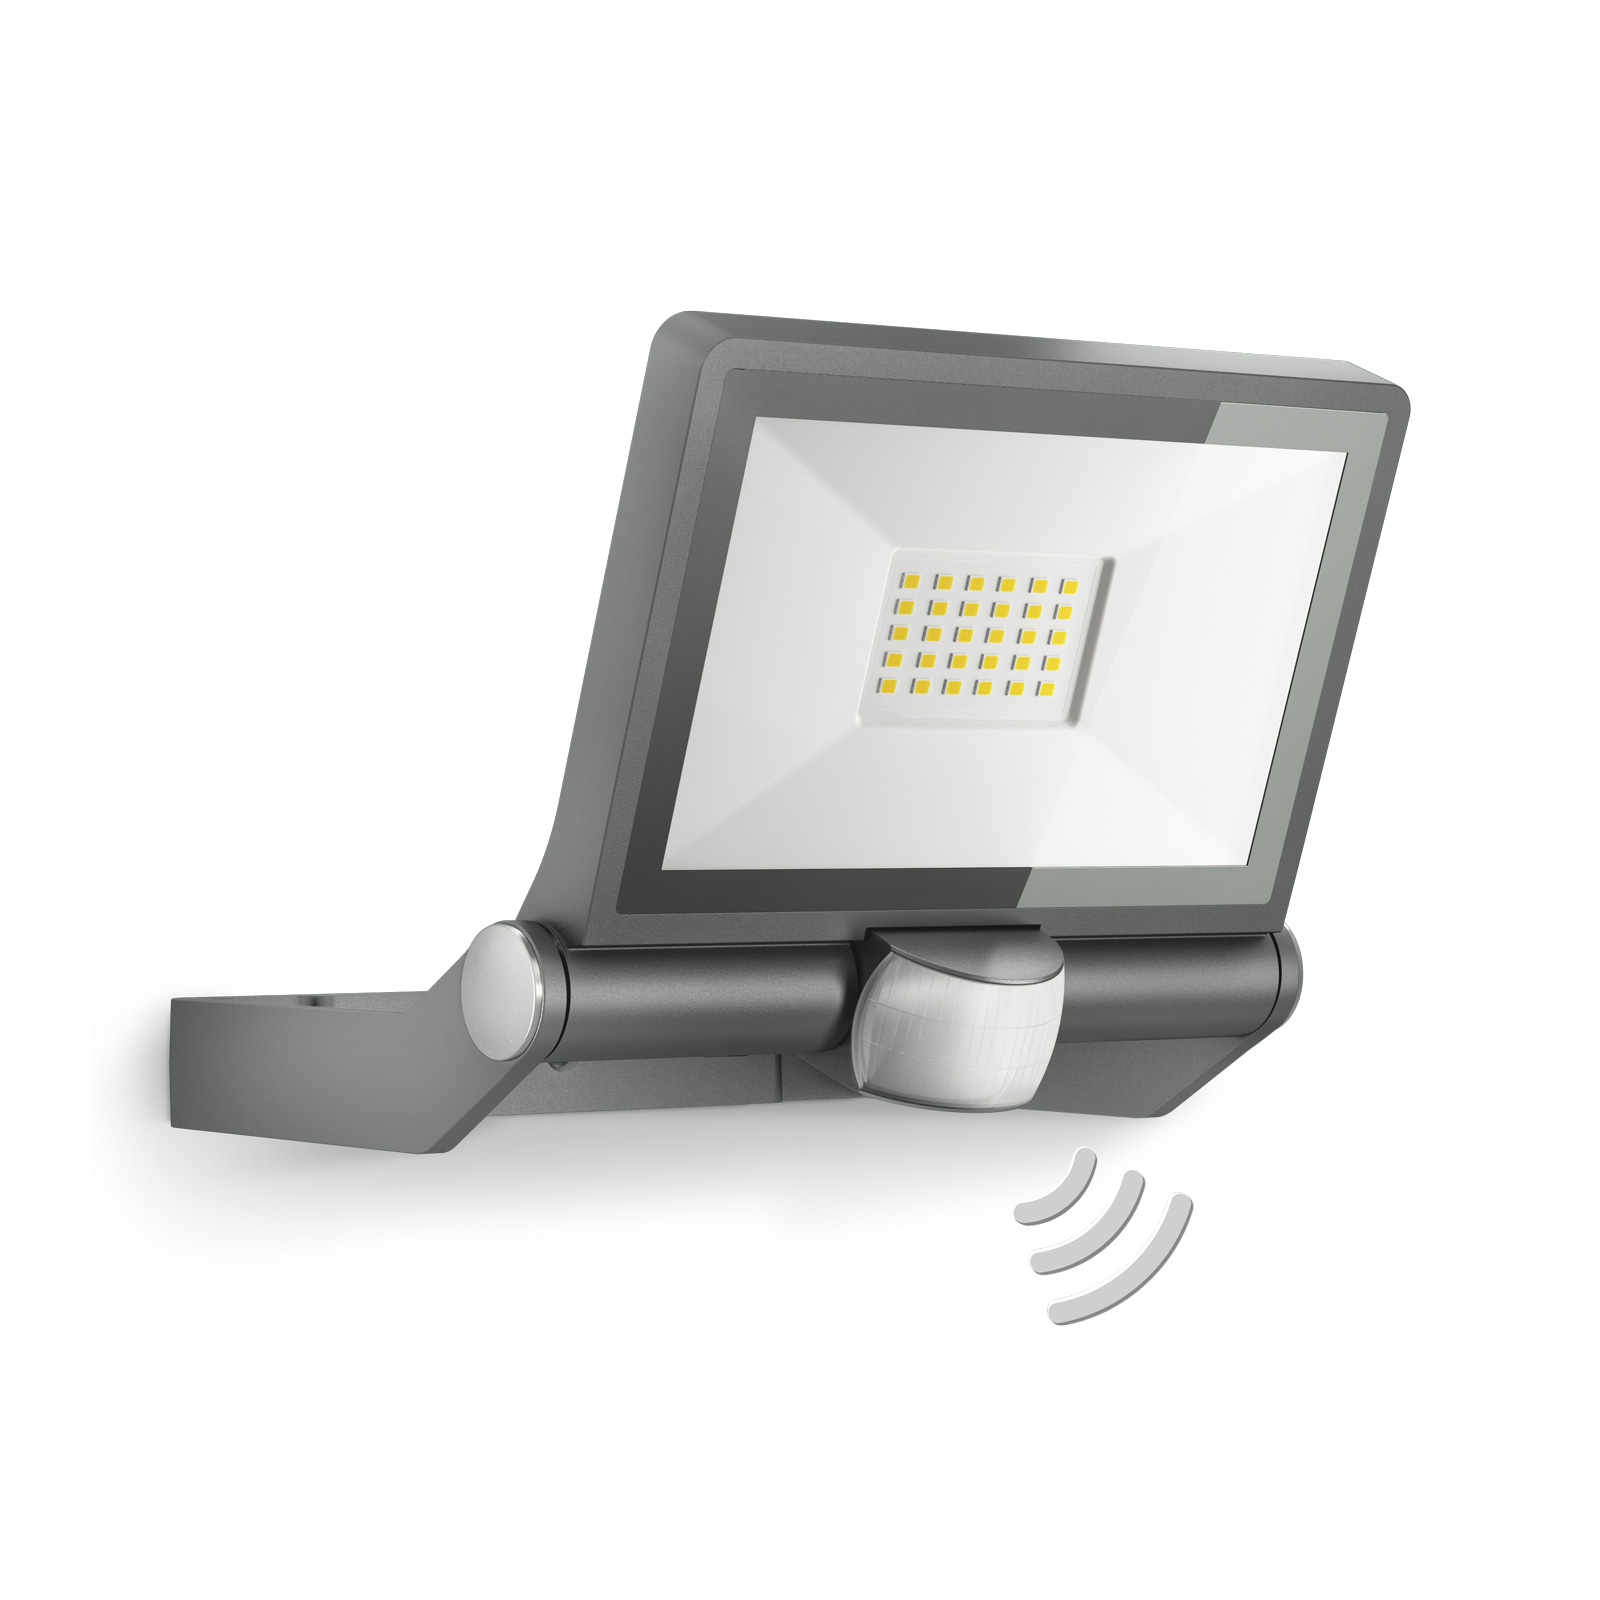 STEINEL XLED One sensor spot, antrasitt, 20x23x19